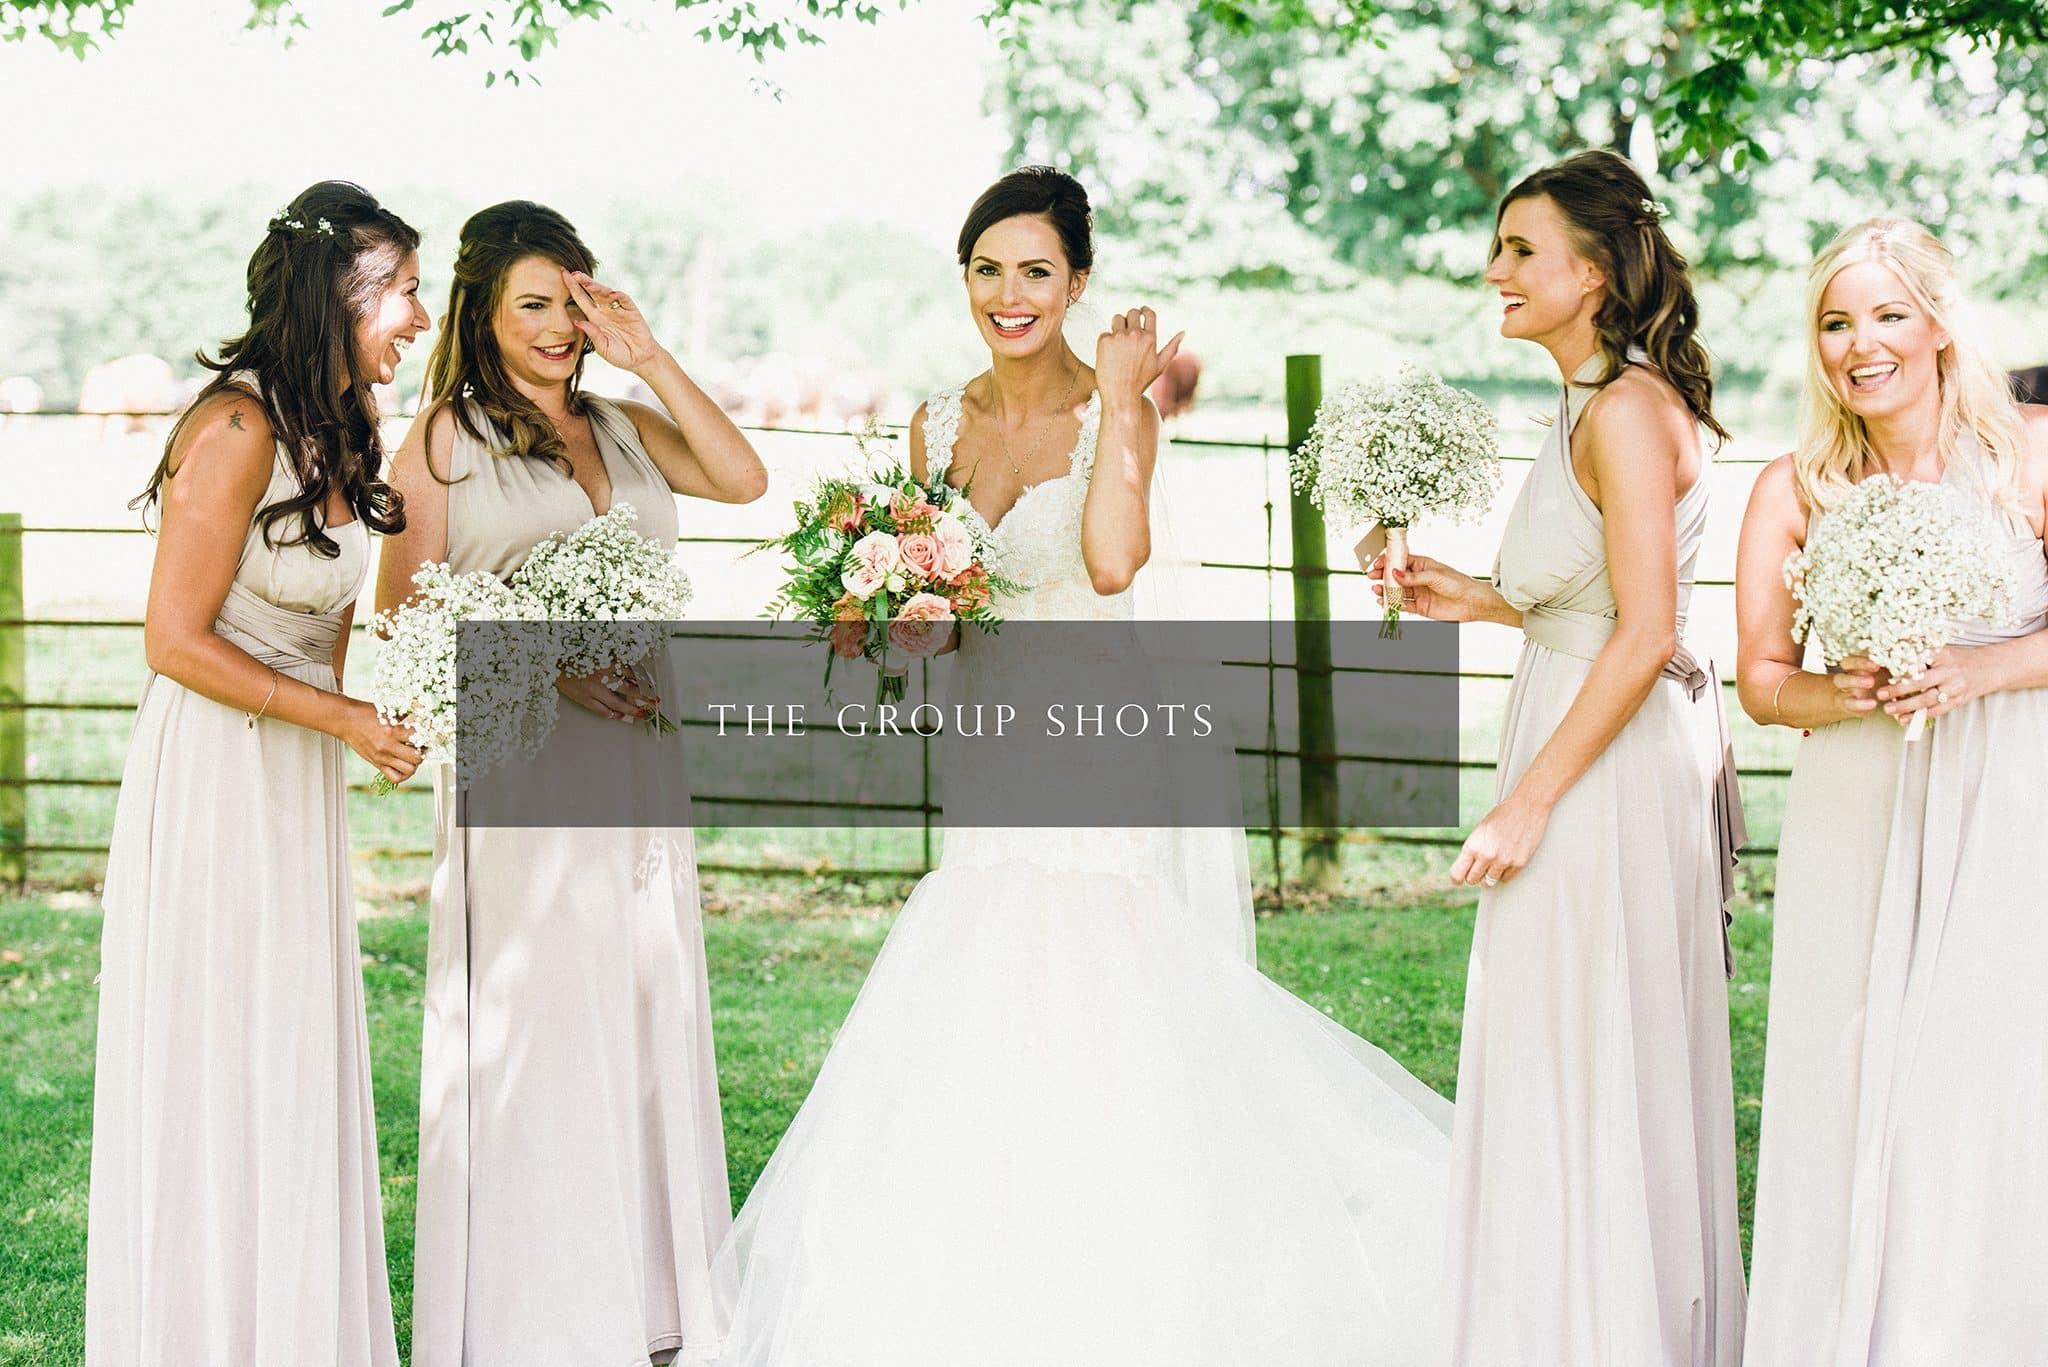 wedding photographer Milton Keynes; wedding photography Milton Keynes; destination wedding photographer